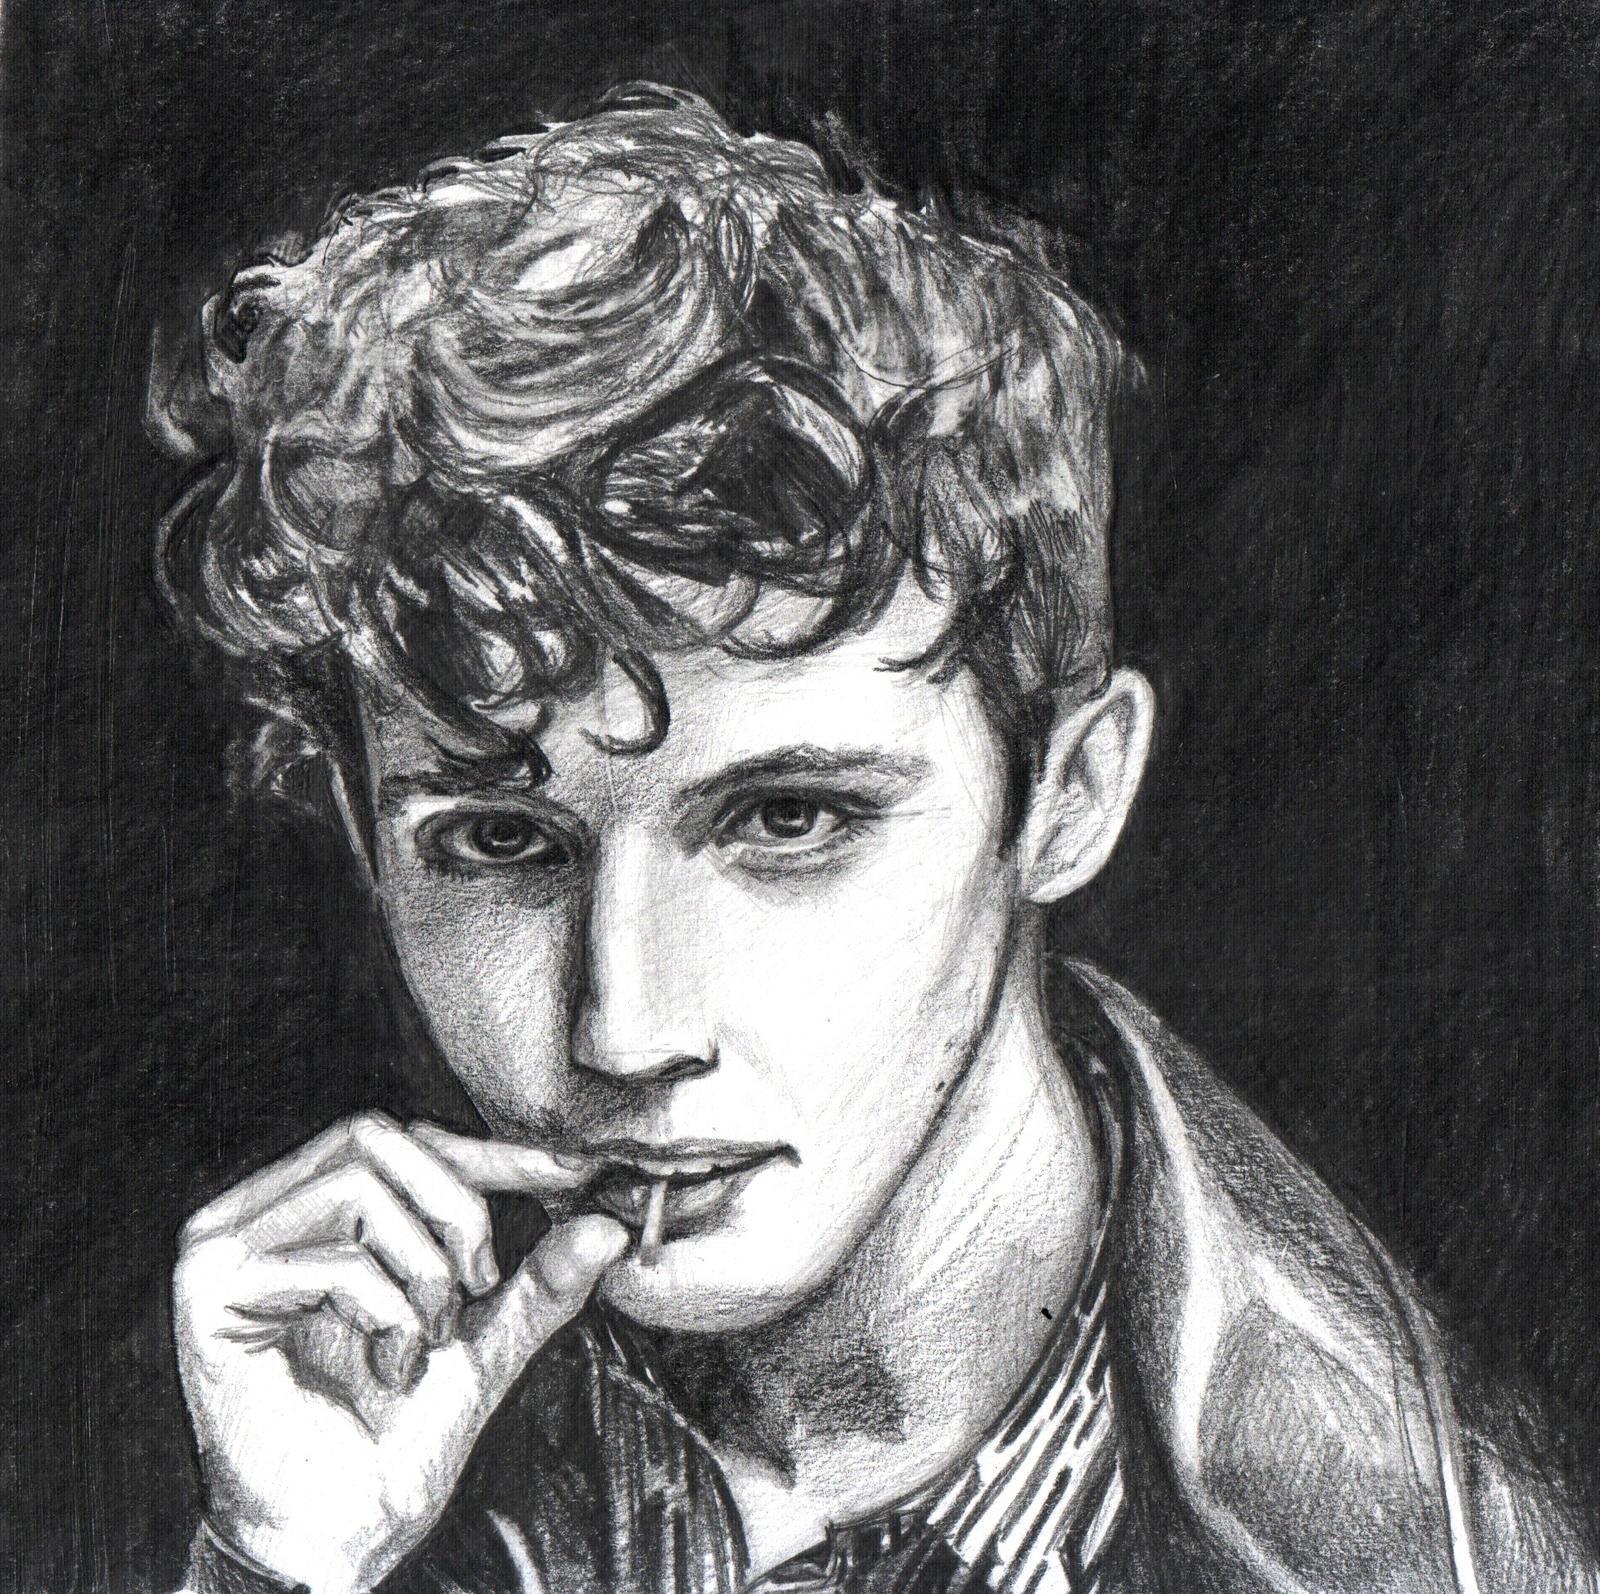 Troye Sivan by DochGrozy on DeviantArt